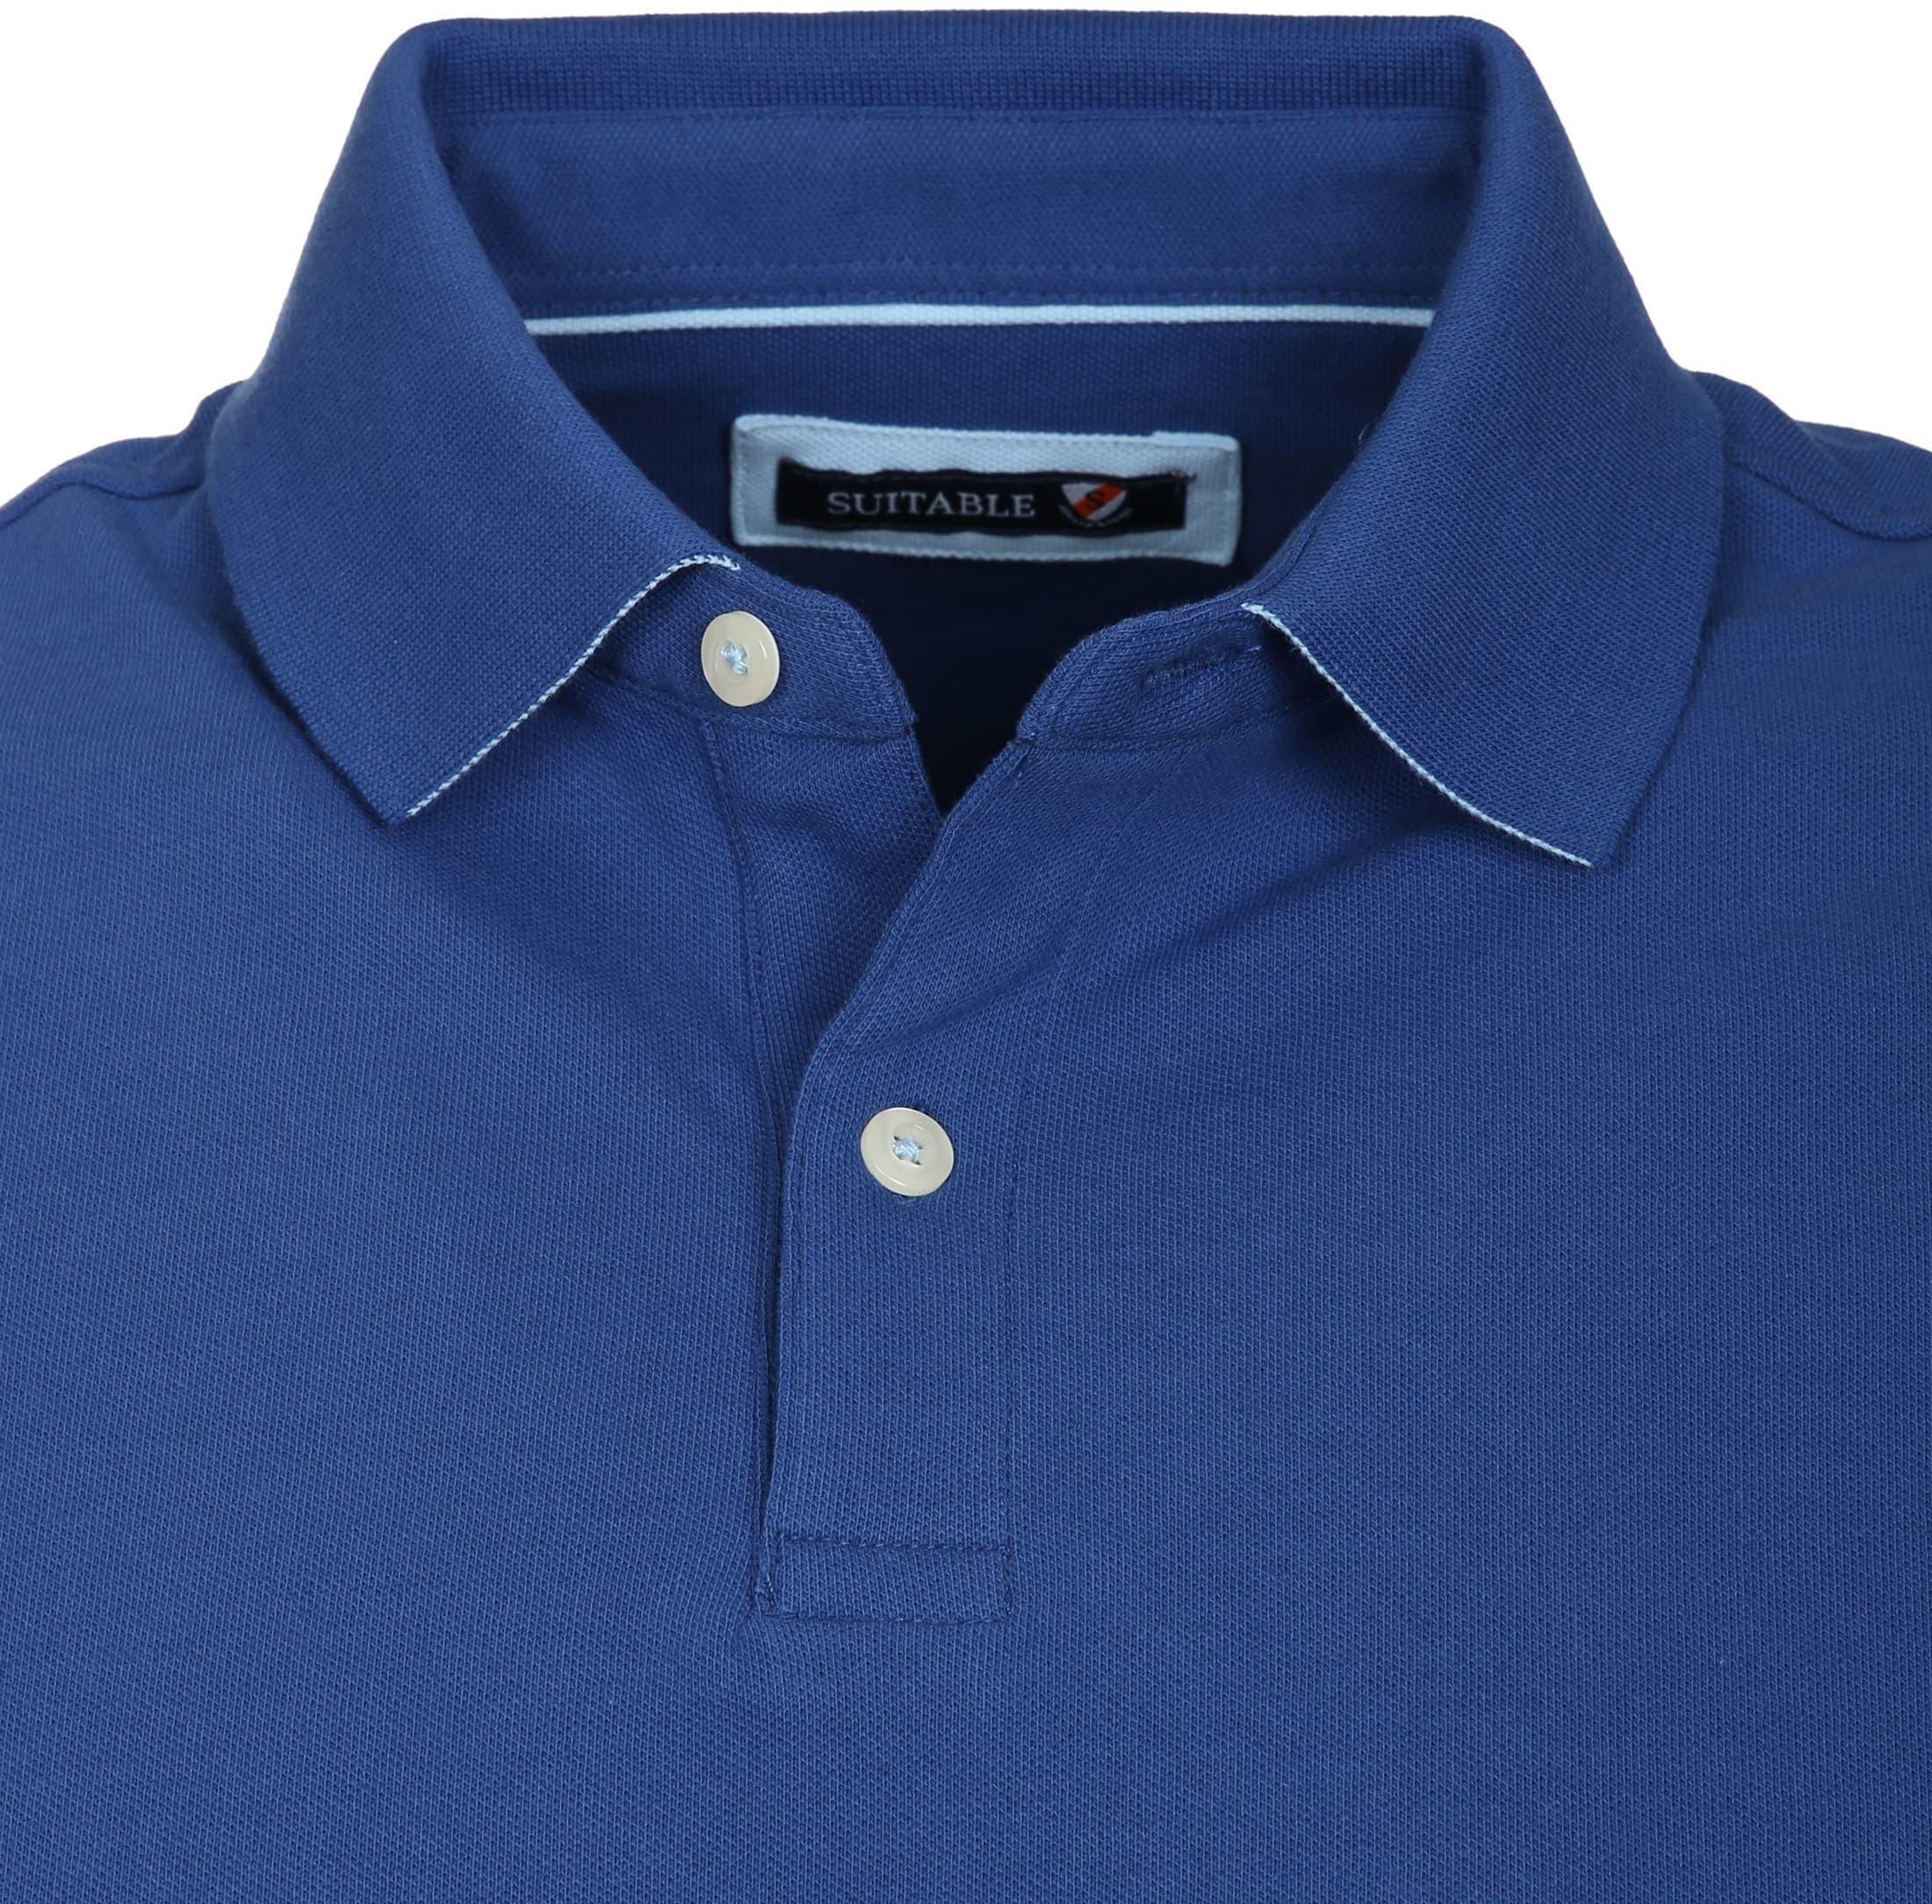 Suitable Poloshirt Basic Royal Blue foto 1